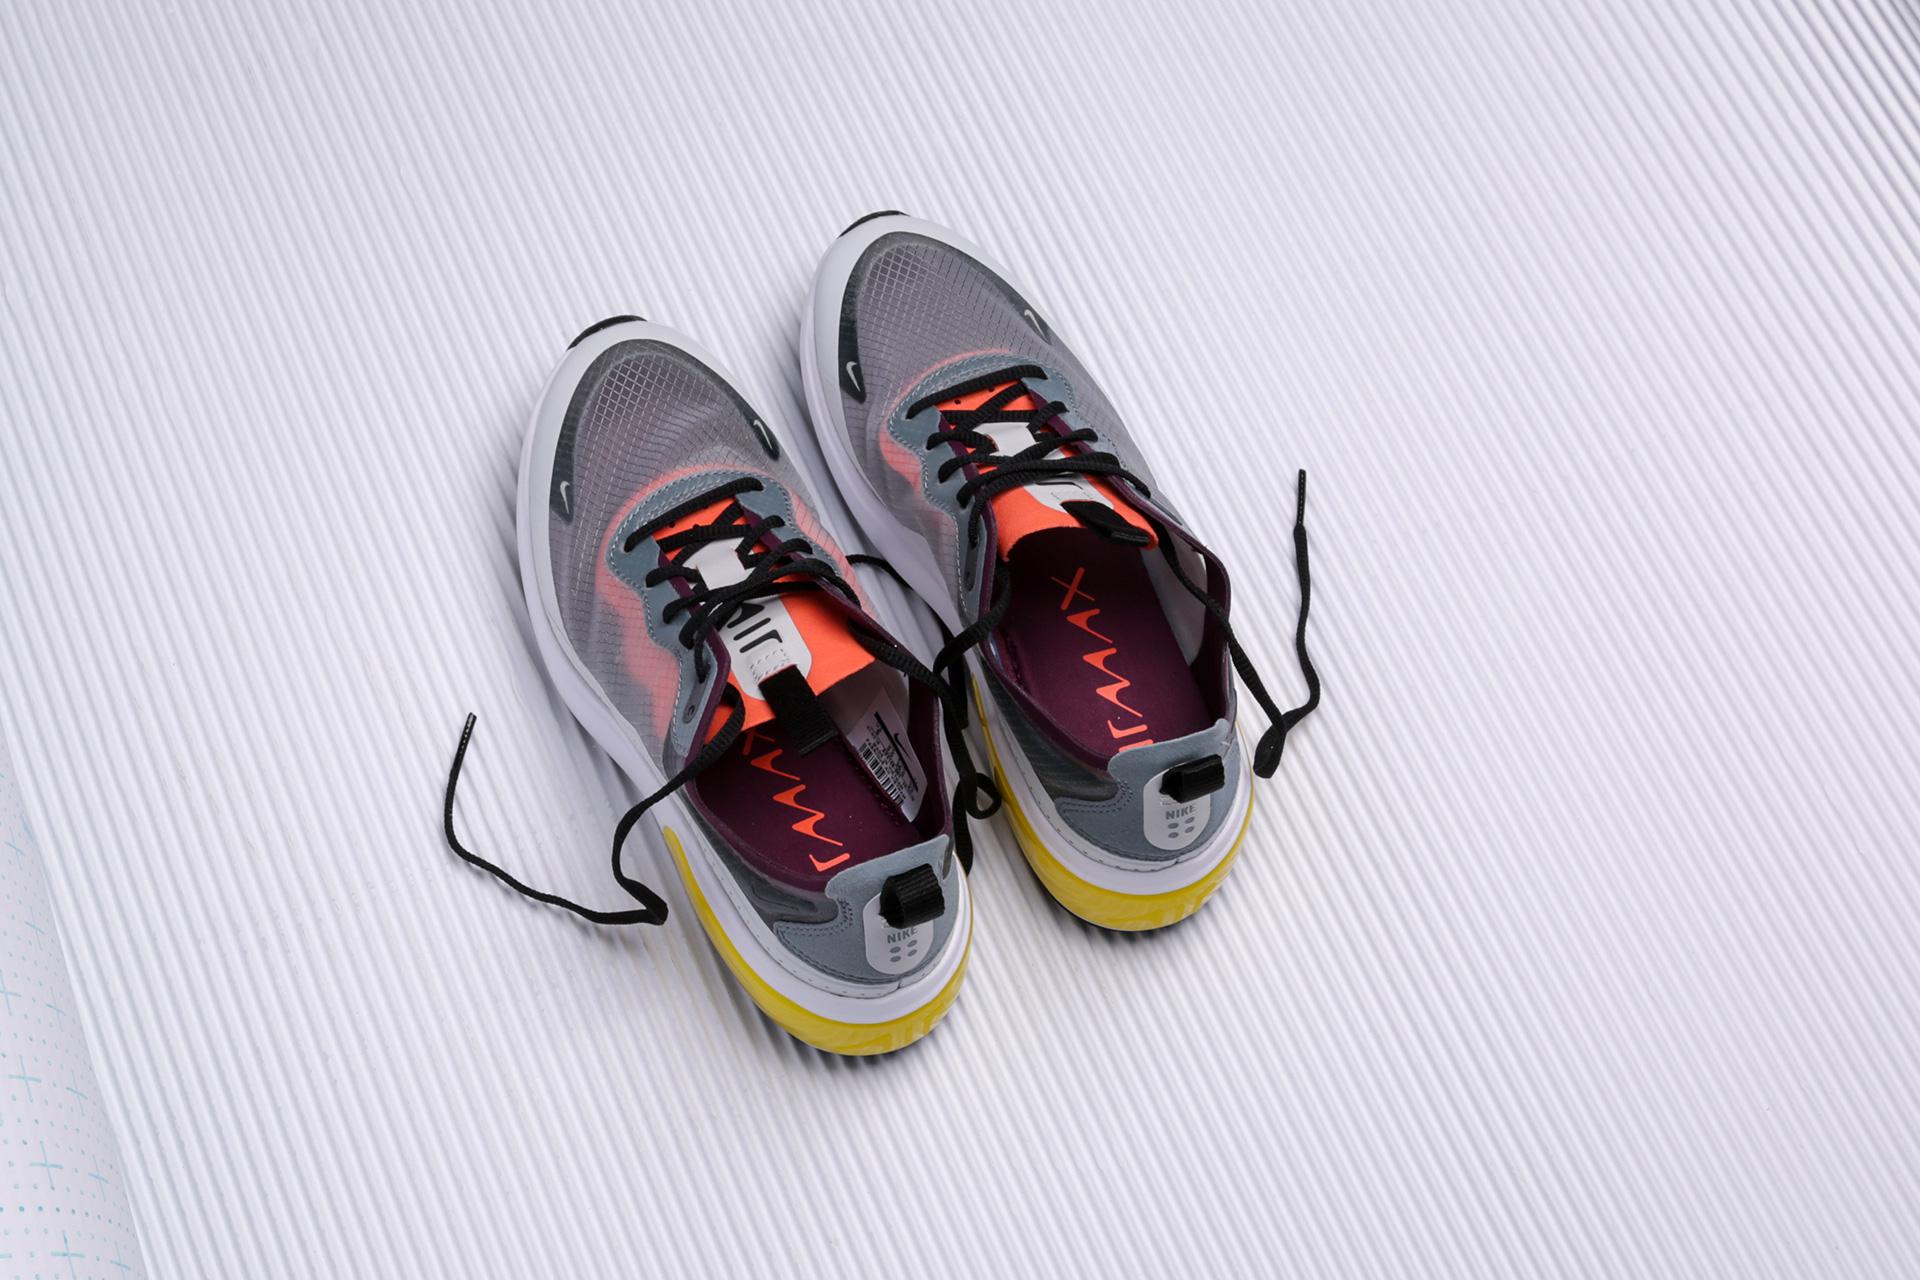 9ea52b5e ... 6 картинки; Купить женские серые кроссовки Nike Air Max Dia SE QS -  фото 7 картинки